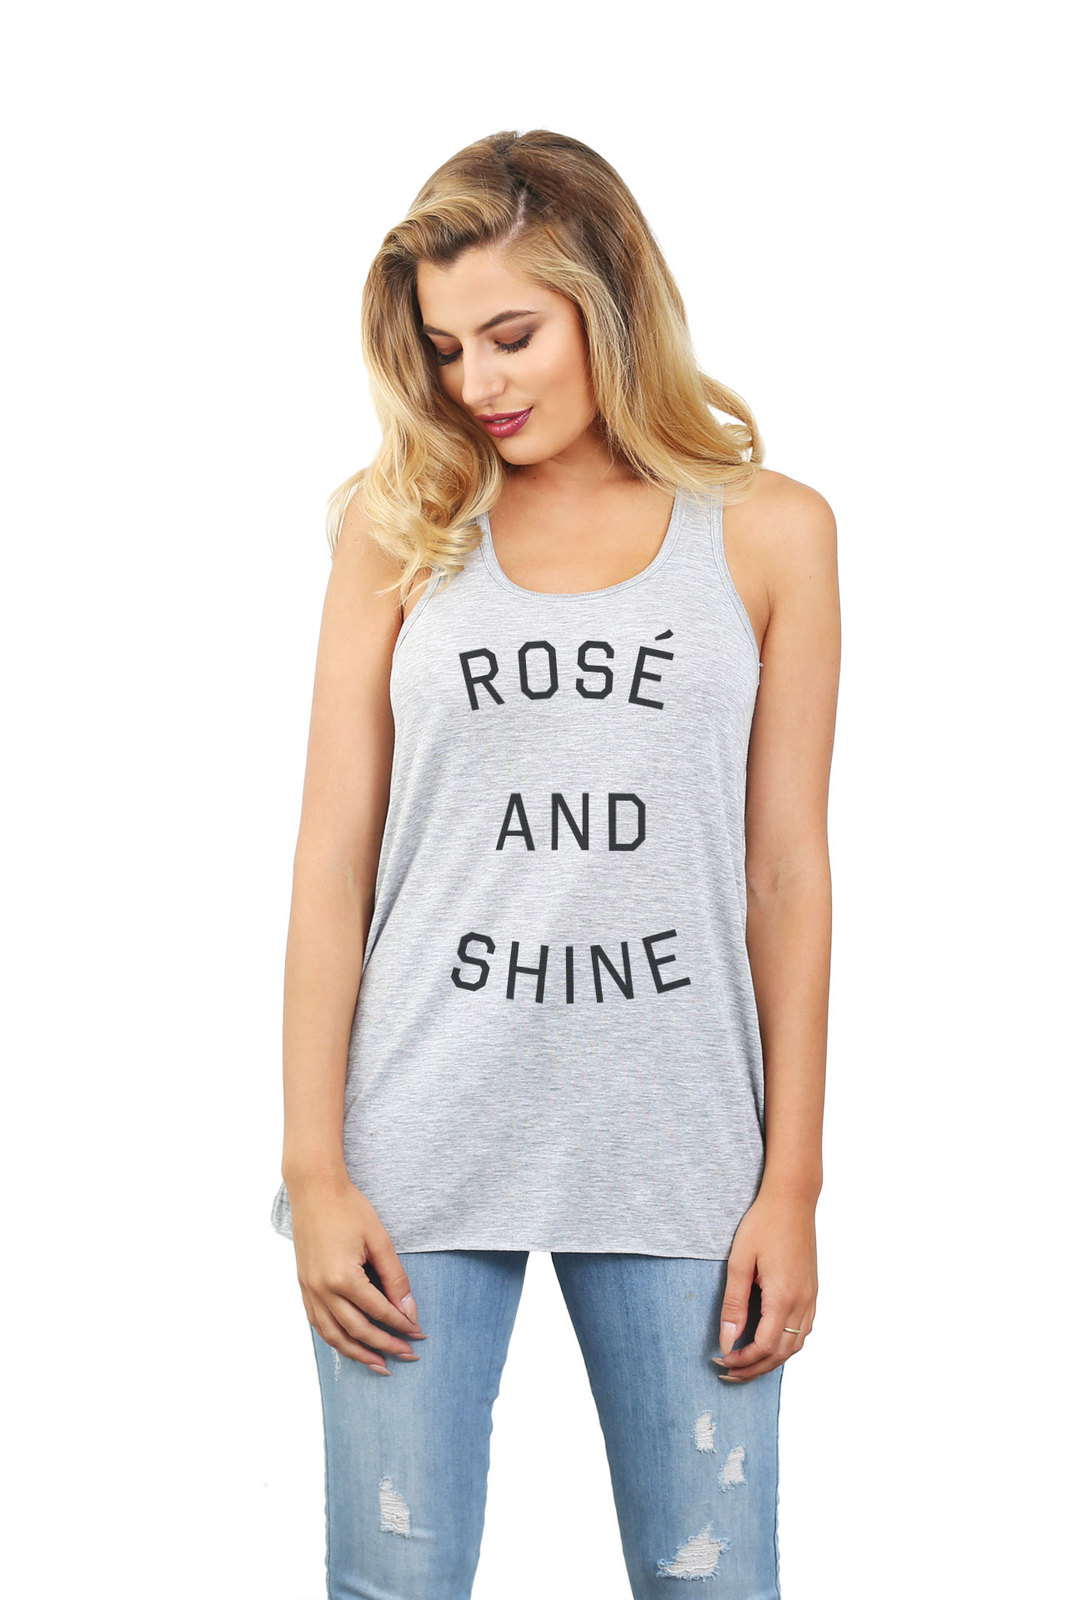 Thread Tank Rose And Shine Women's Sleeveless Flowy Racerback Tank Top Sport Gre